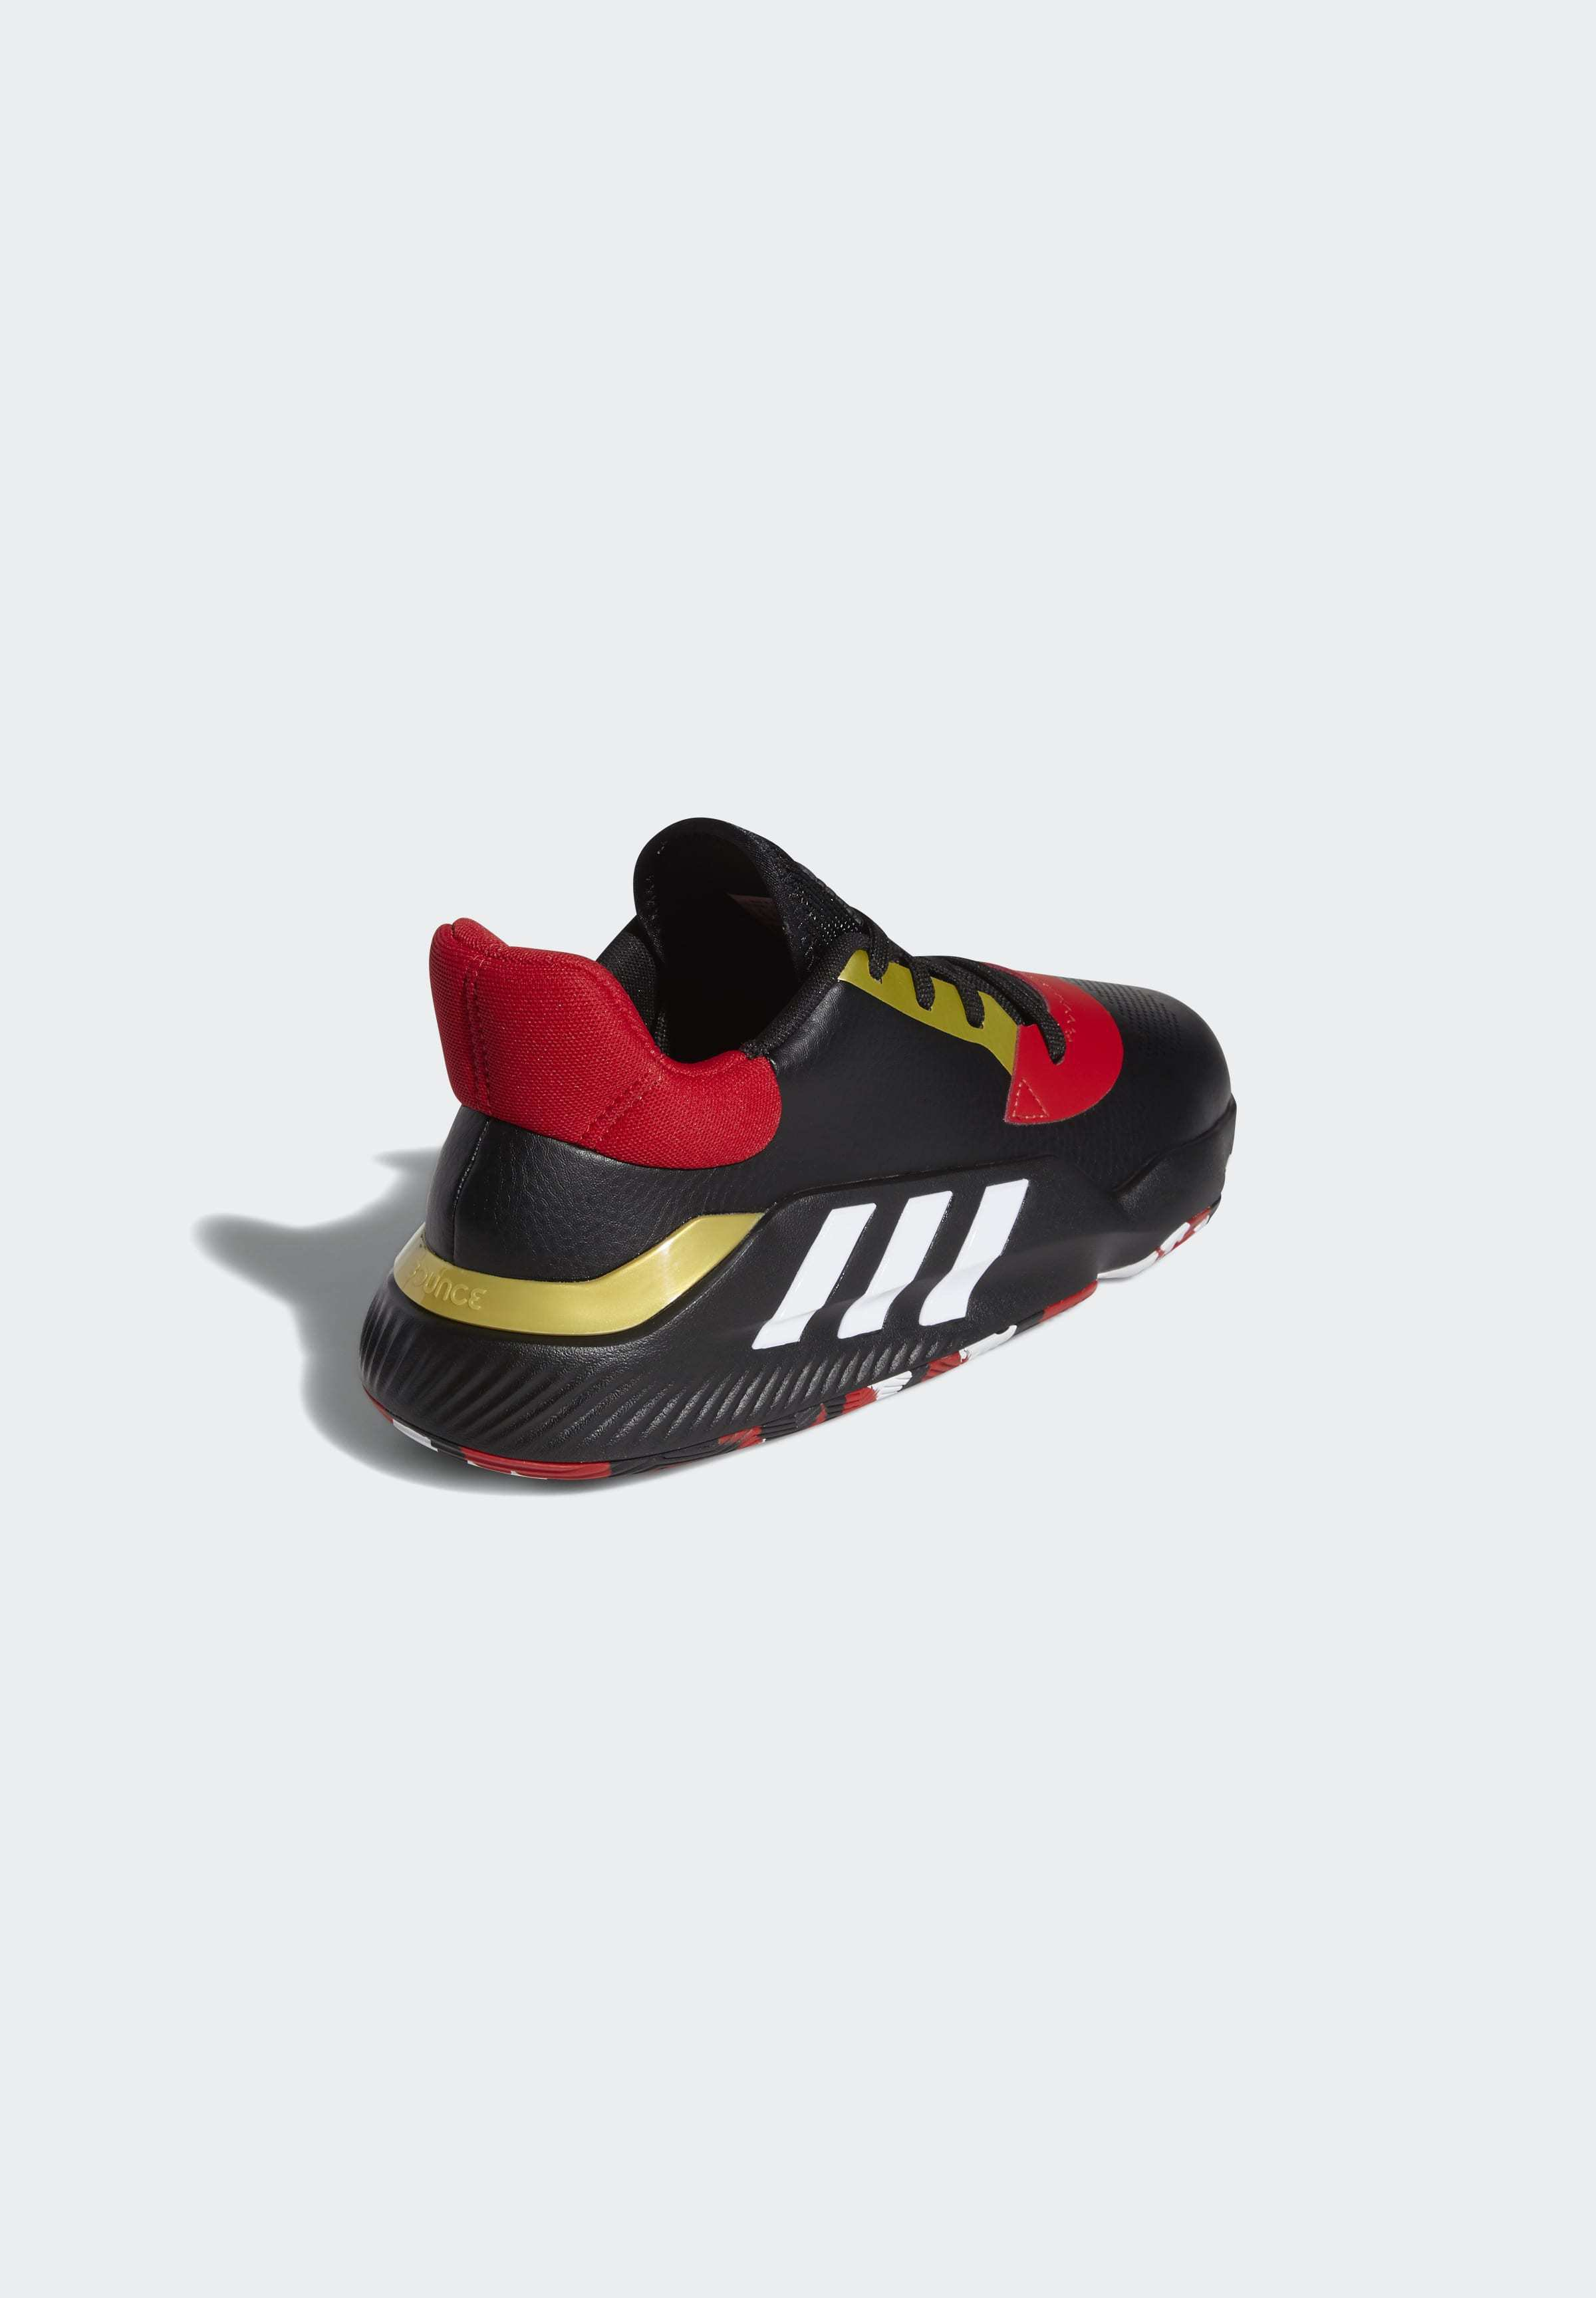 adidas Performance PRO BOUNCE 2019 LOW SHOES - Basketballschuh - black/schwarz - Herrenschuhe QrbYb